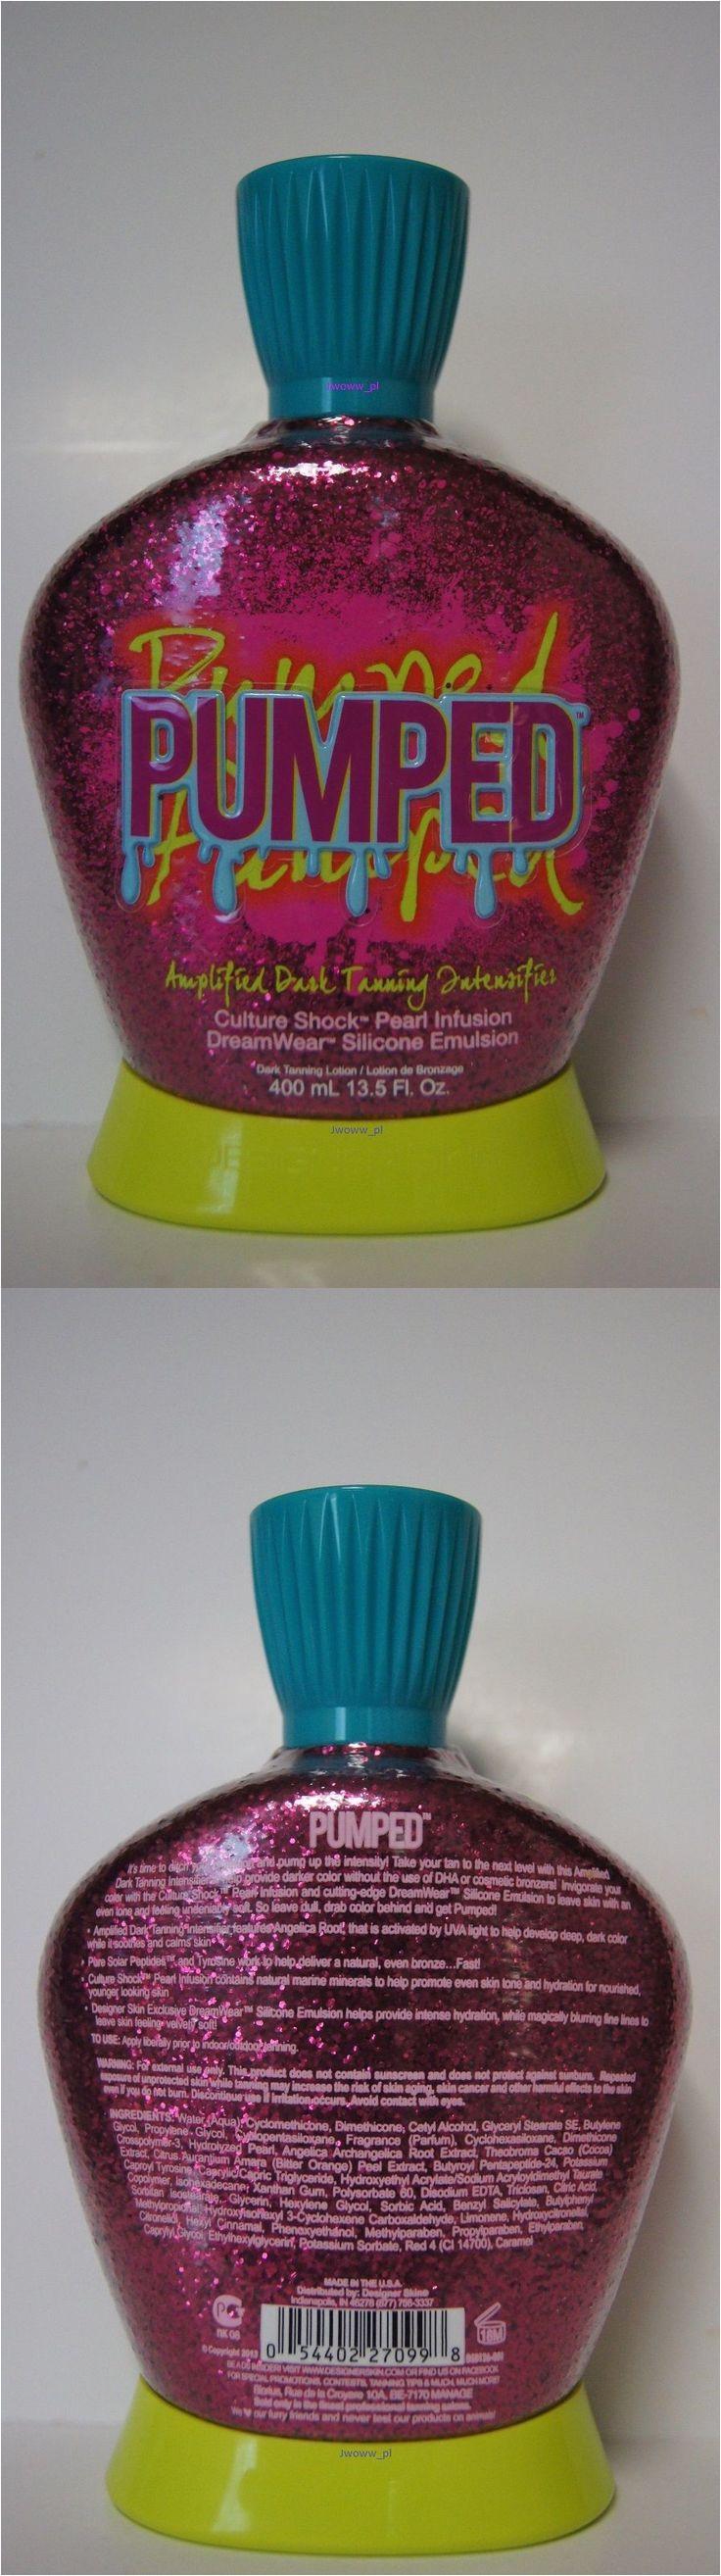 tanning lotion new designer skin pumped amplified dark tanning intensifier silicone emulsion buy